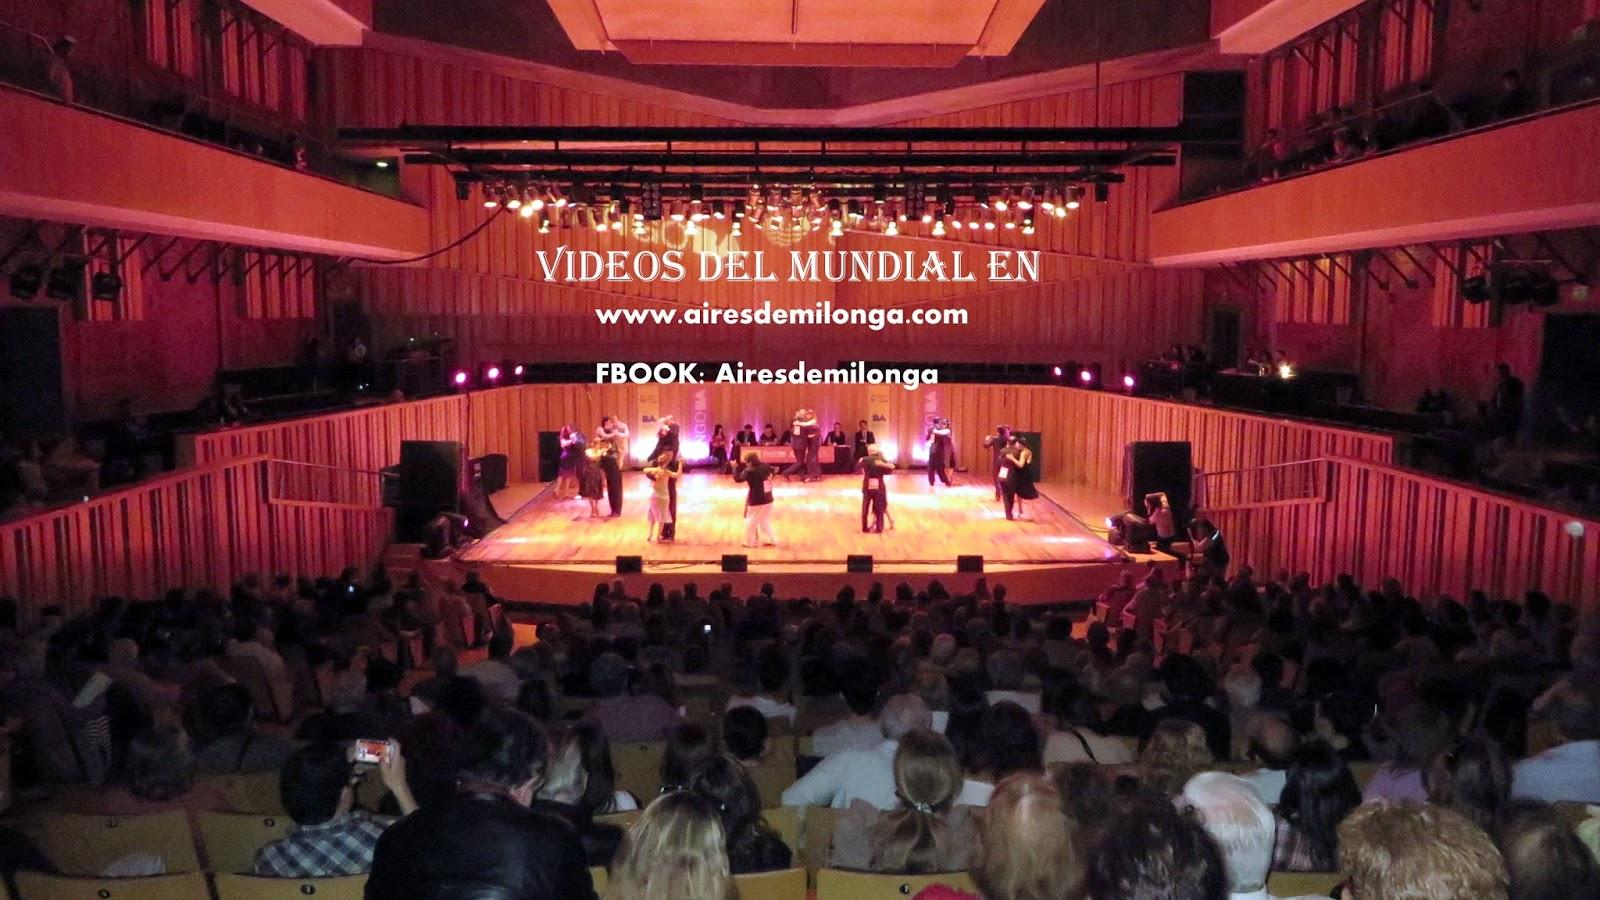 http://www.airesdemilonga.com/es/videos/mundial-de-tango